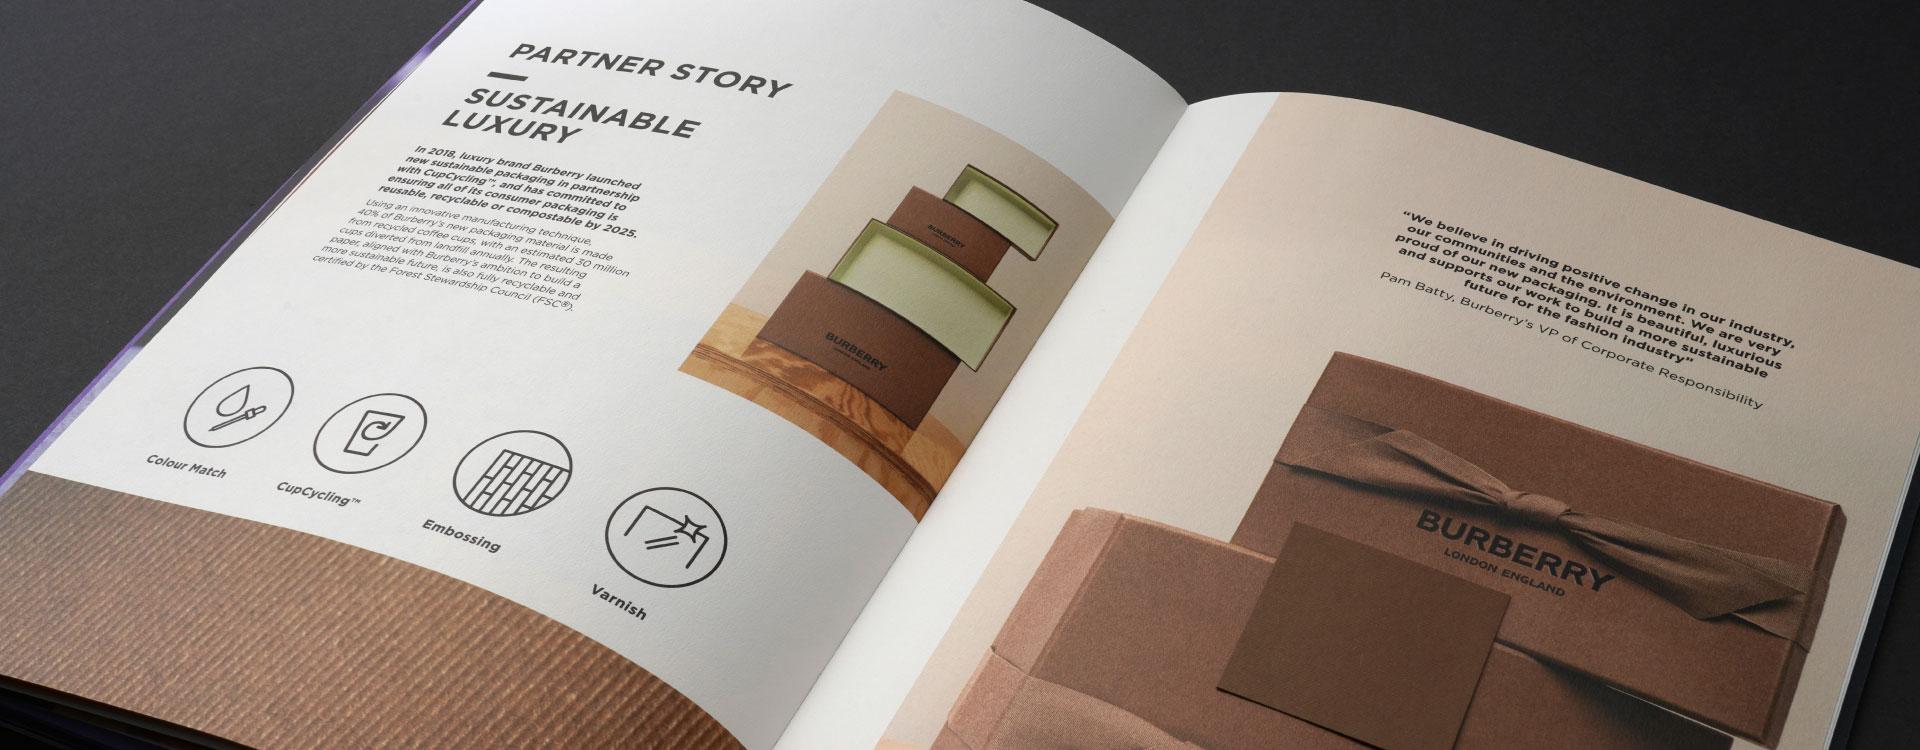 James Cropper Tailor Made Service brochure partner story spread